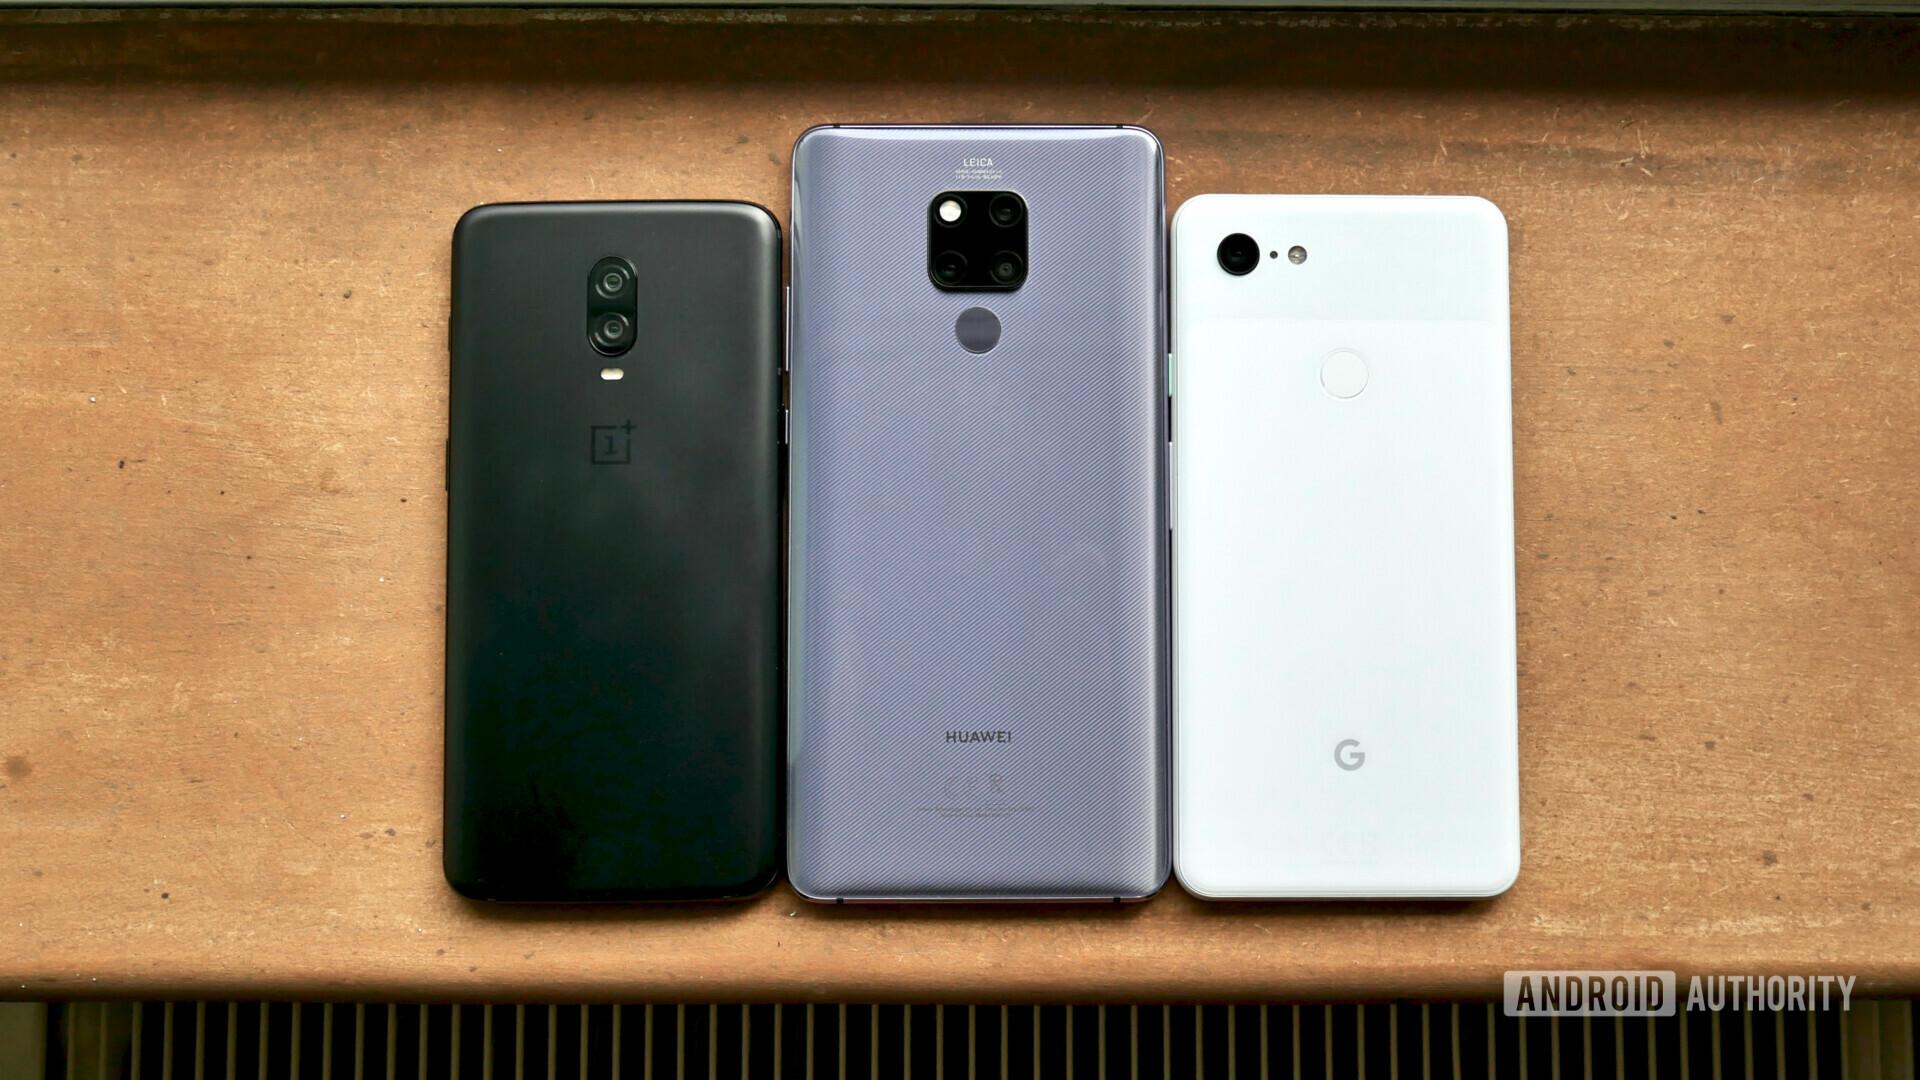 Huawei Mate 20 X vs OnePlus 6T vs Google Pixel 3 XL